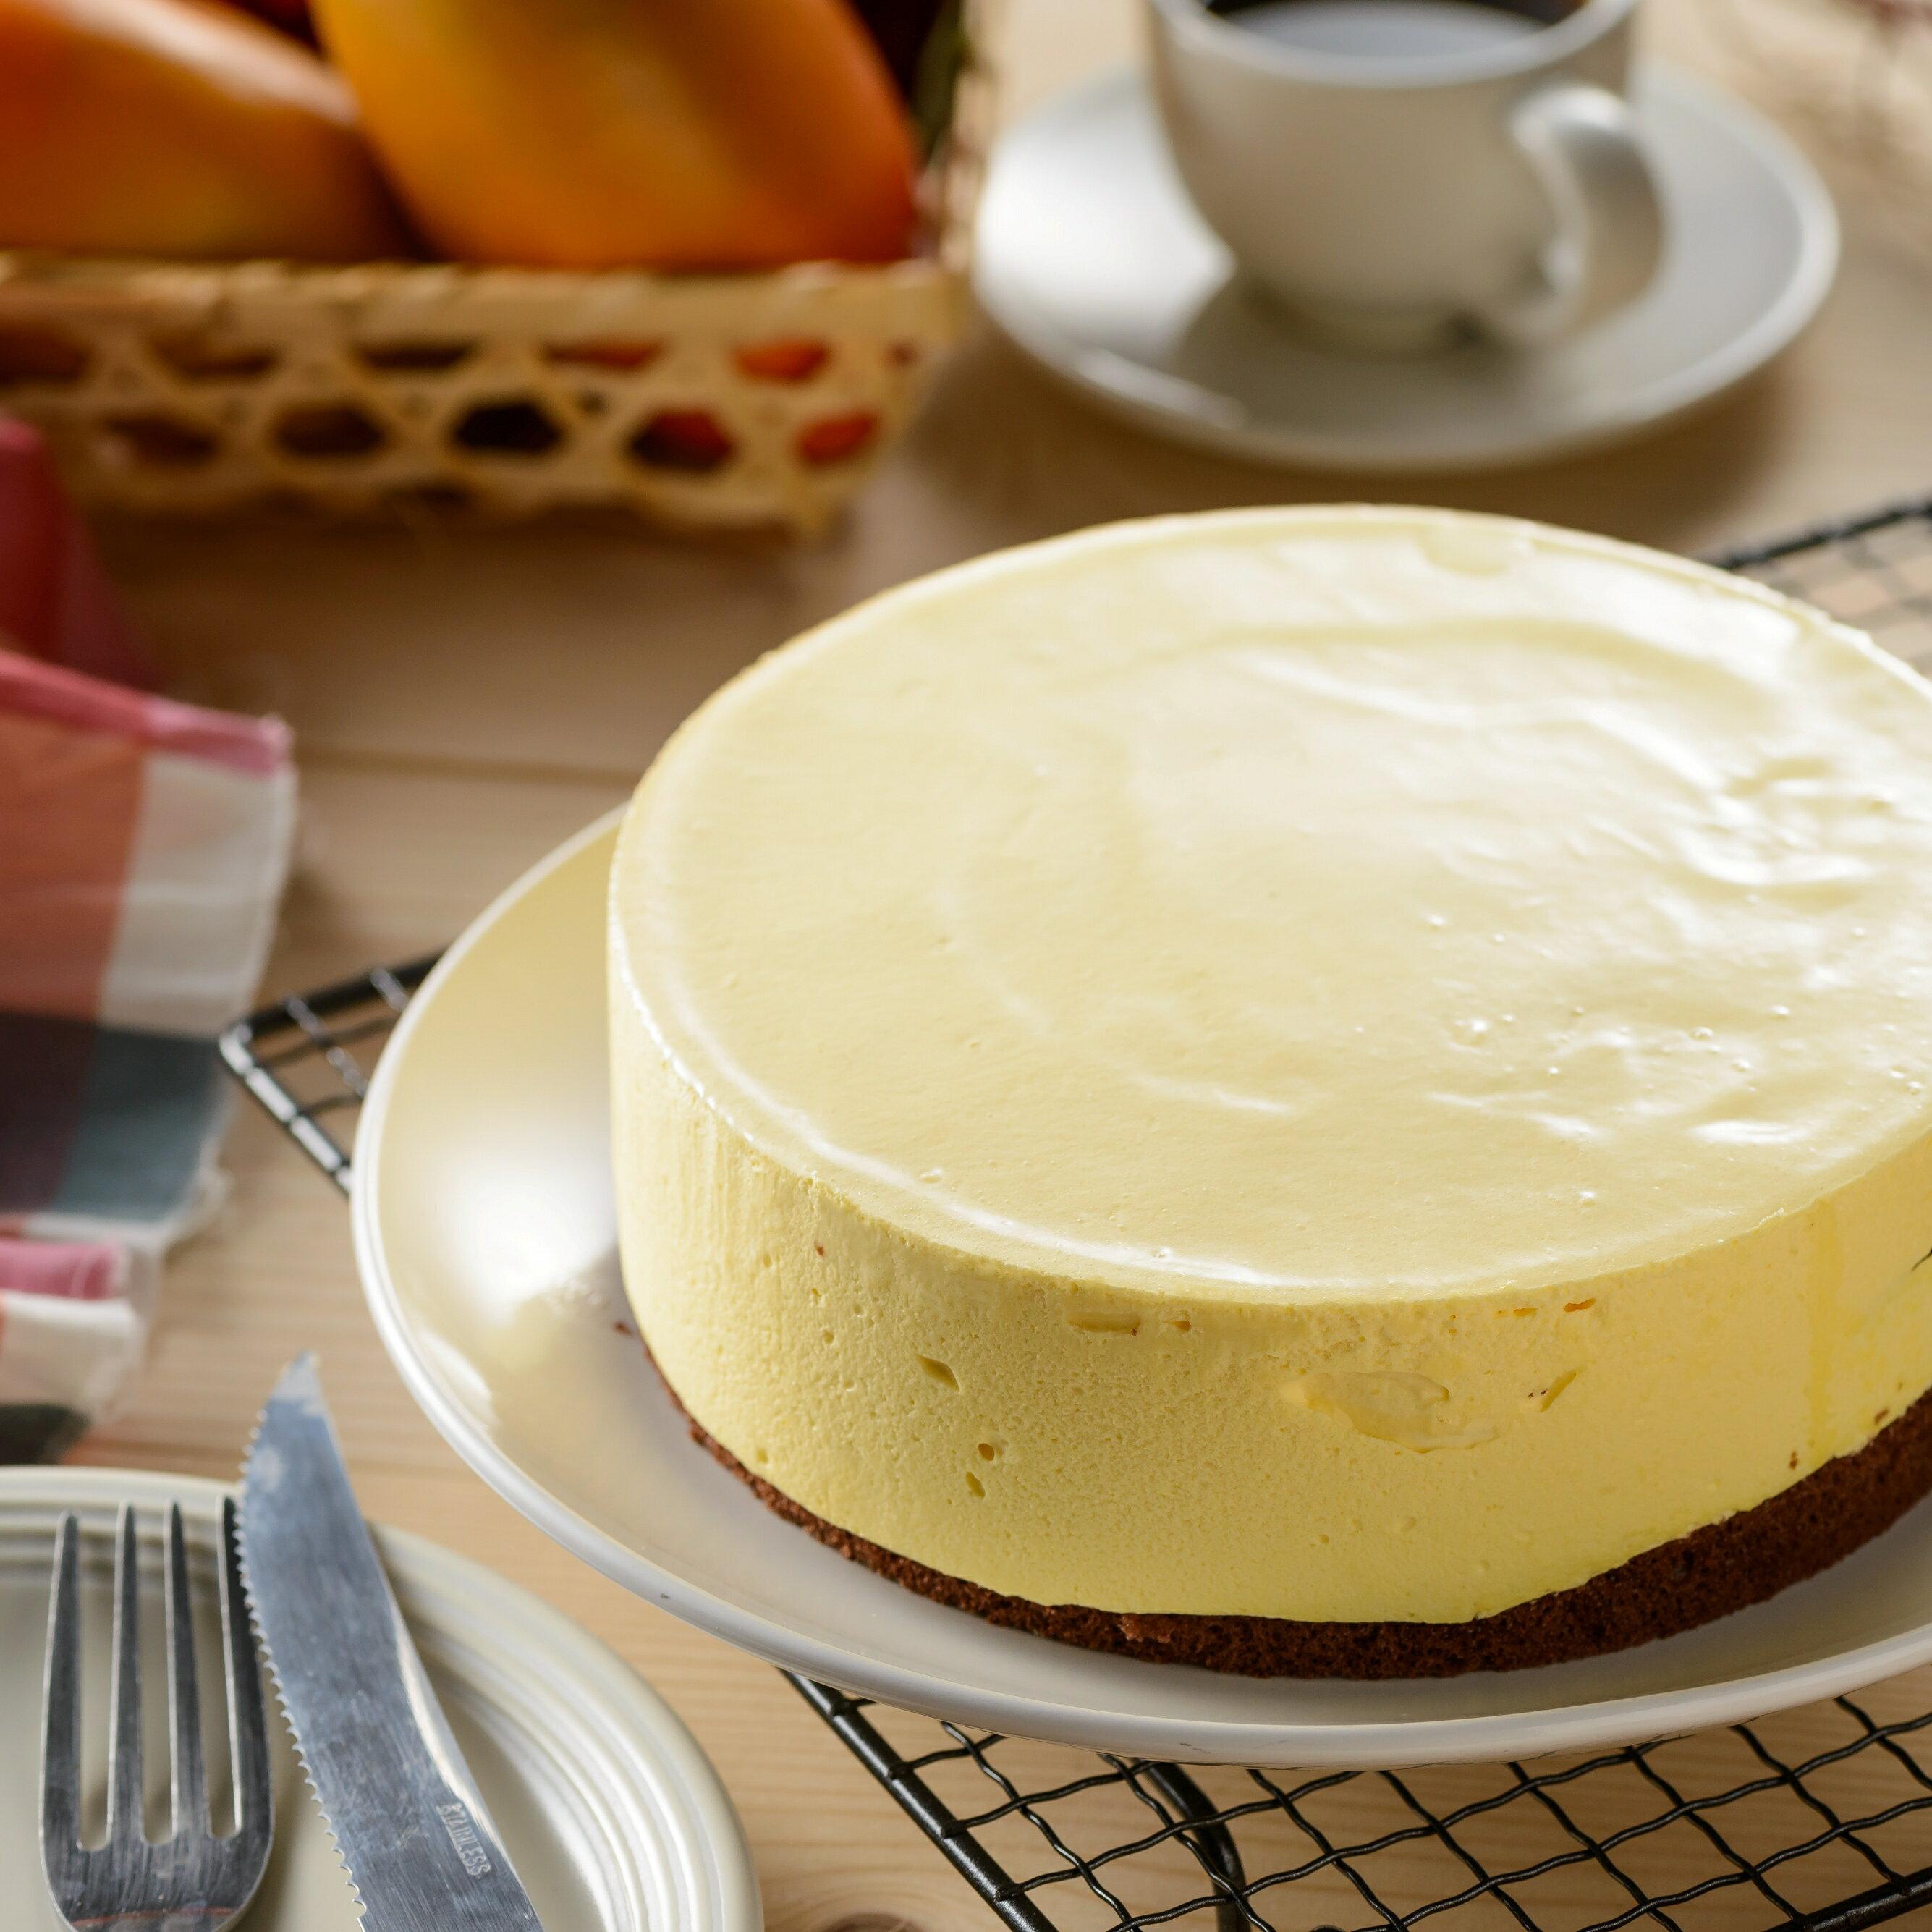 【DONT-CHA 手作】芒果慕斯 6吋 ❤夏日限定❤ Mousse丨果泥慕斯丨黑巧克力蛋糕丨母親節蛋糕丨生日蛋糕丨父親節蛋糕丨甜點丨雙重口感丨愛文芒果 ❤滿499免運❤